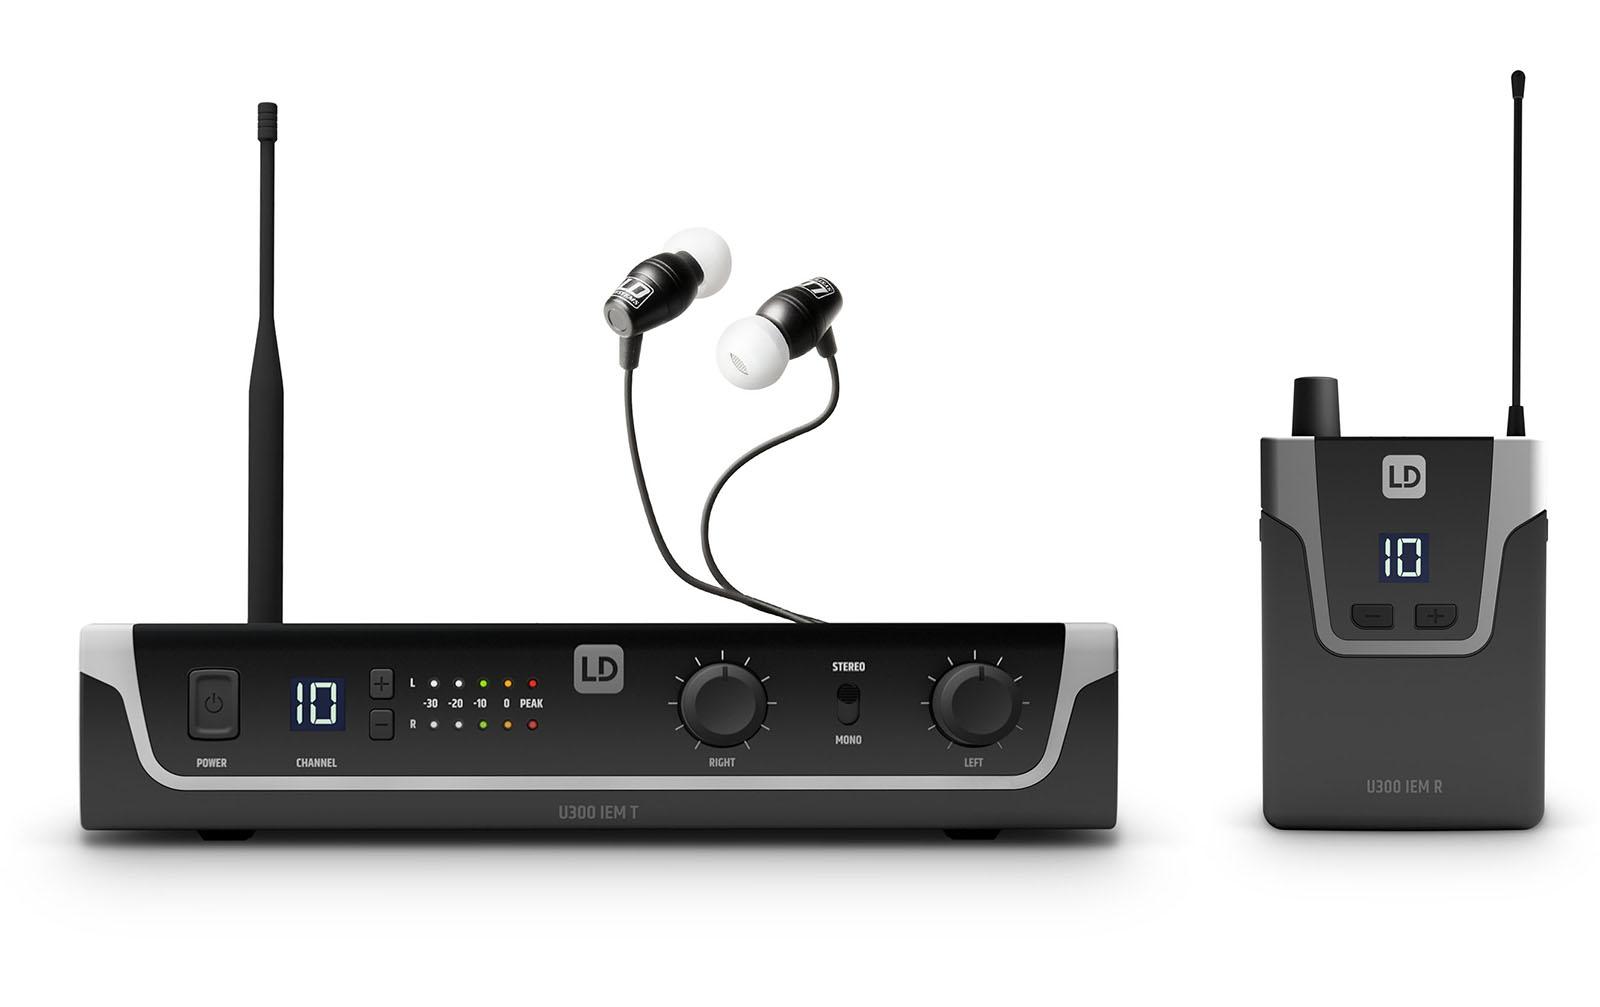 ld-systems-u304-7-iem-hp-in-ear-monitoring-system-mit-ohrha-rern